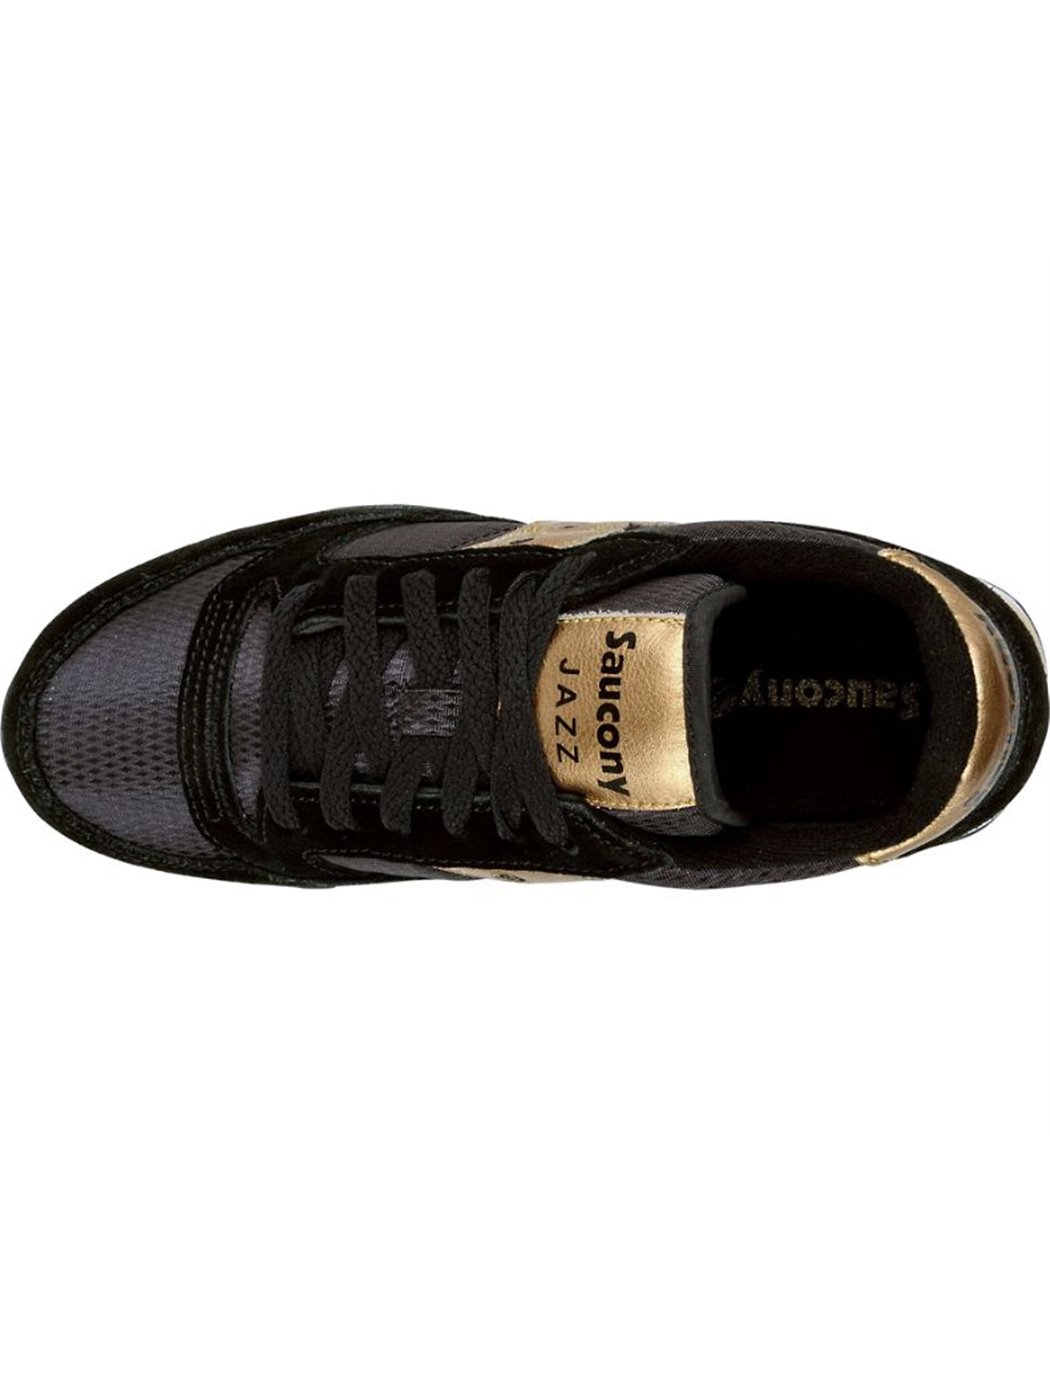 SAUCONY 1044-521 BLACK-GOLD SNEAKERS